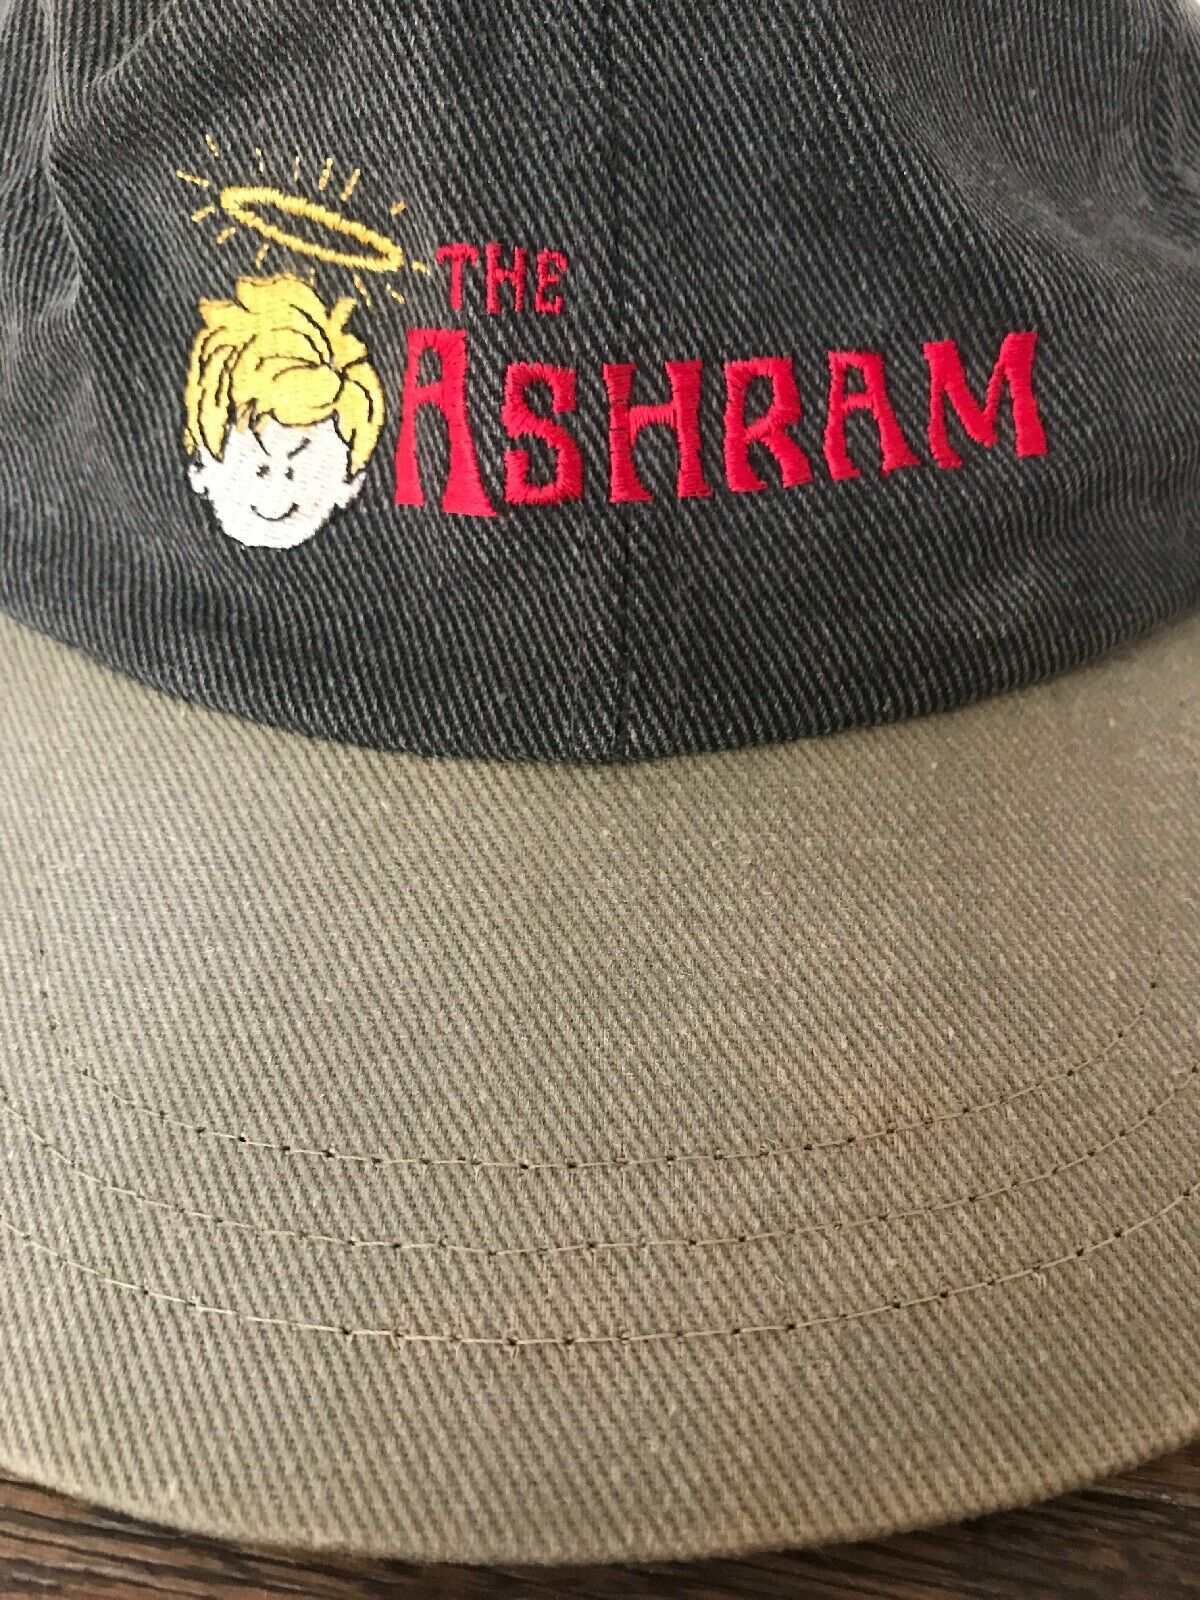 THE ASHRAM Exclusive Yoga Health Hike Retreat Calabasas Baseball Cap Hat